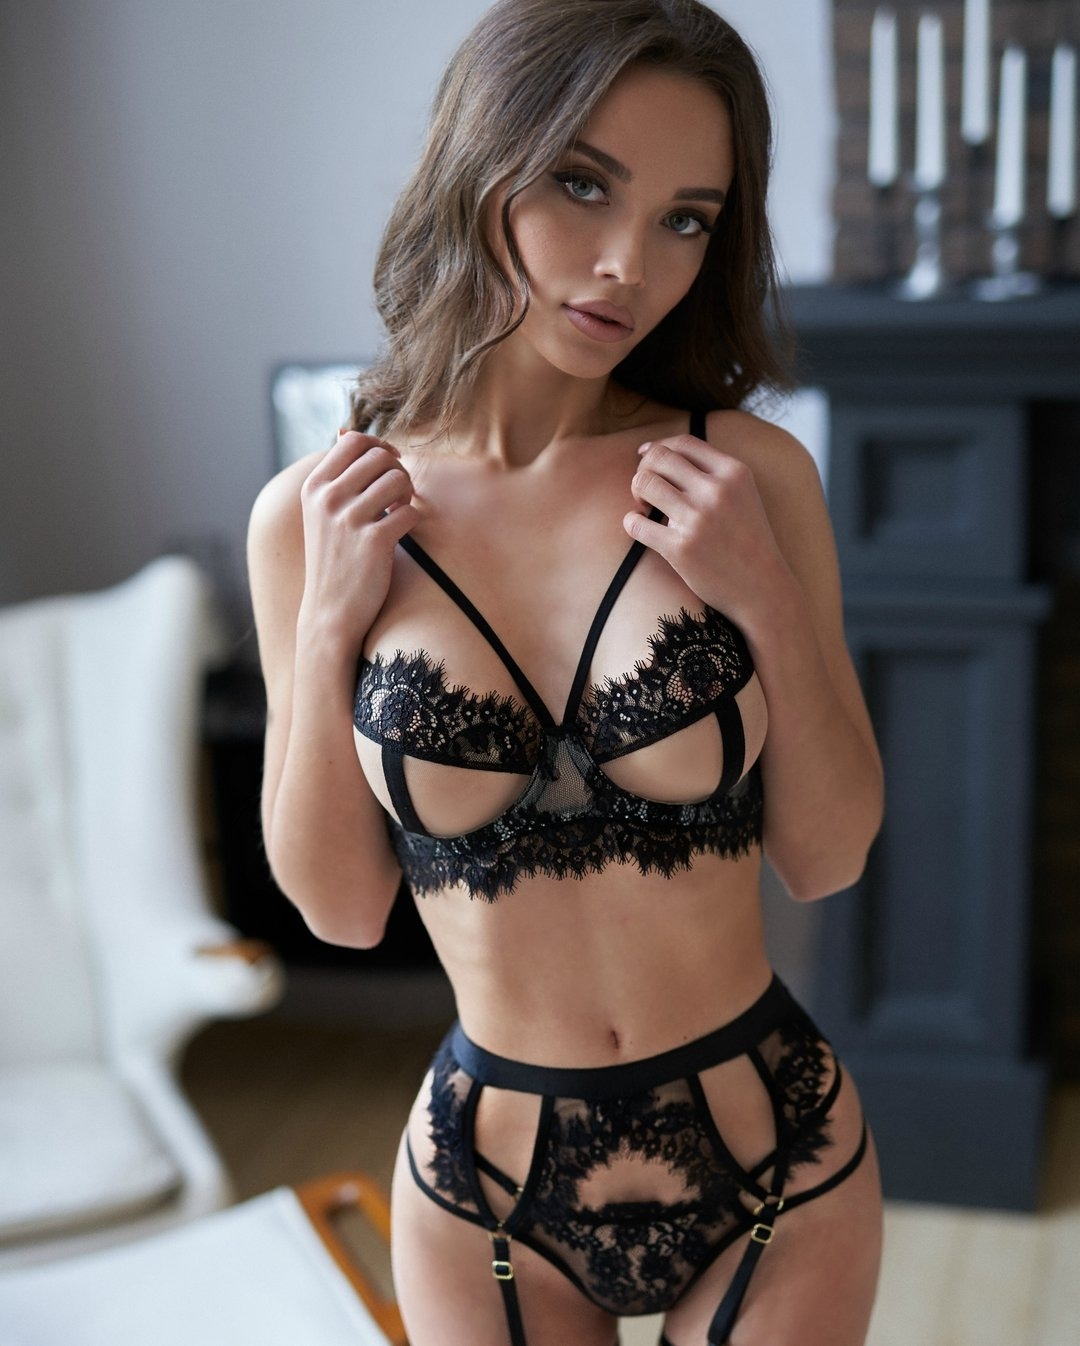 Hot Sale Lady Latest Design Sexy Elegant Woman Bra